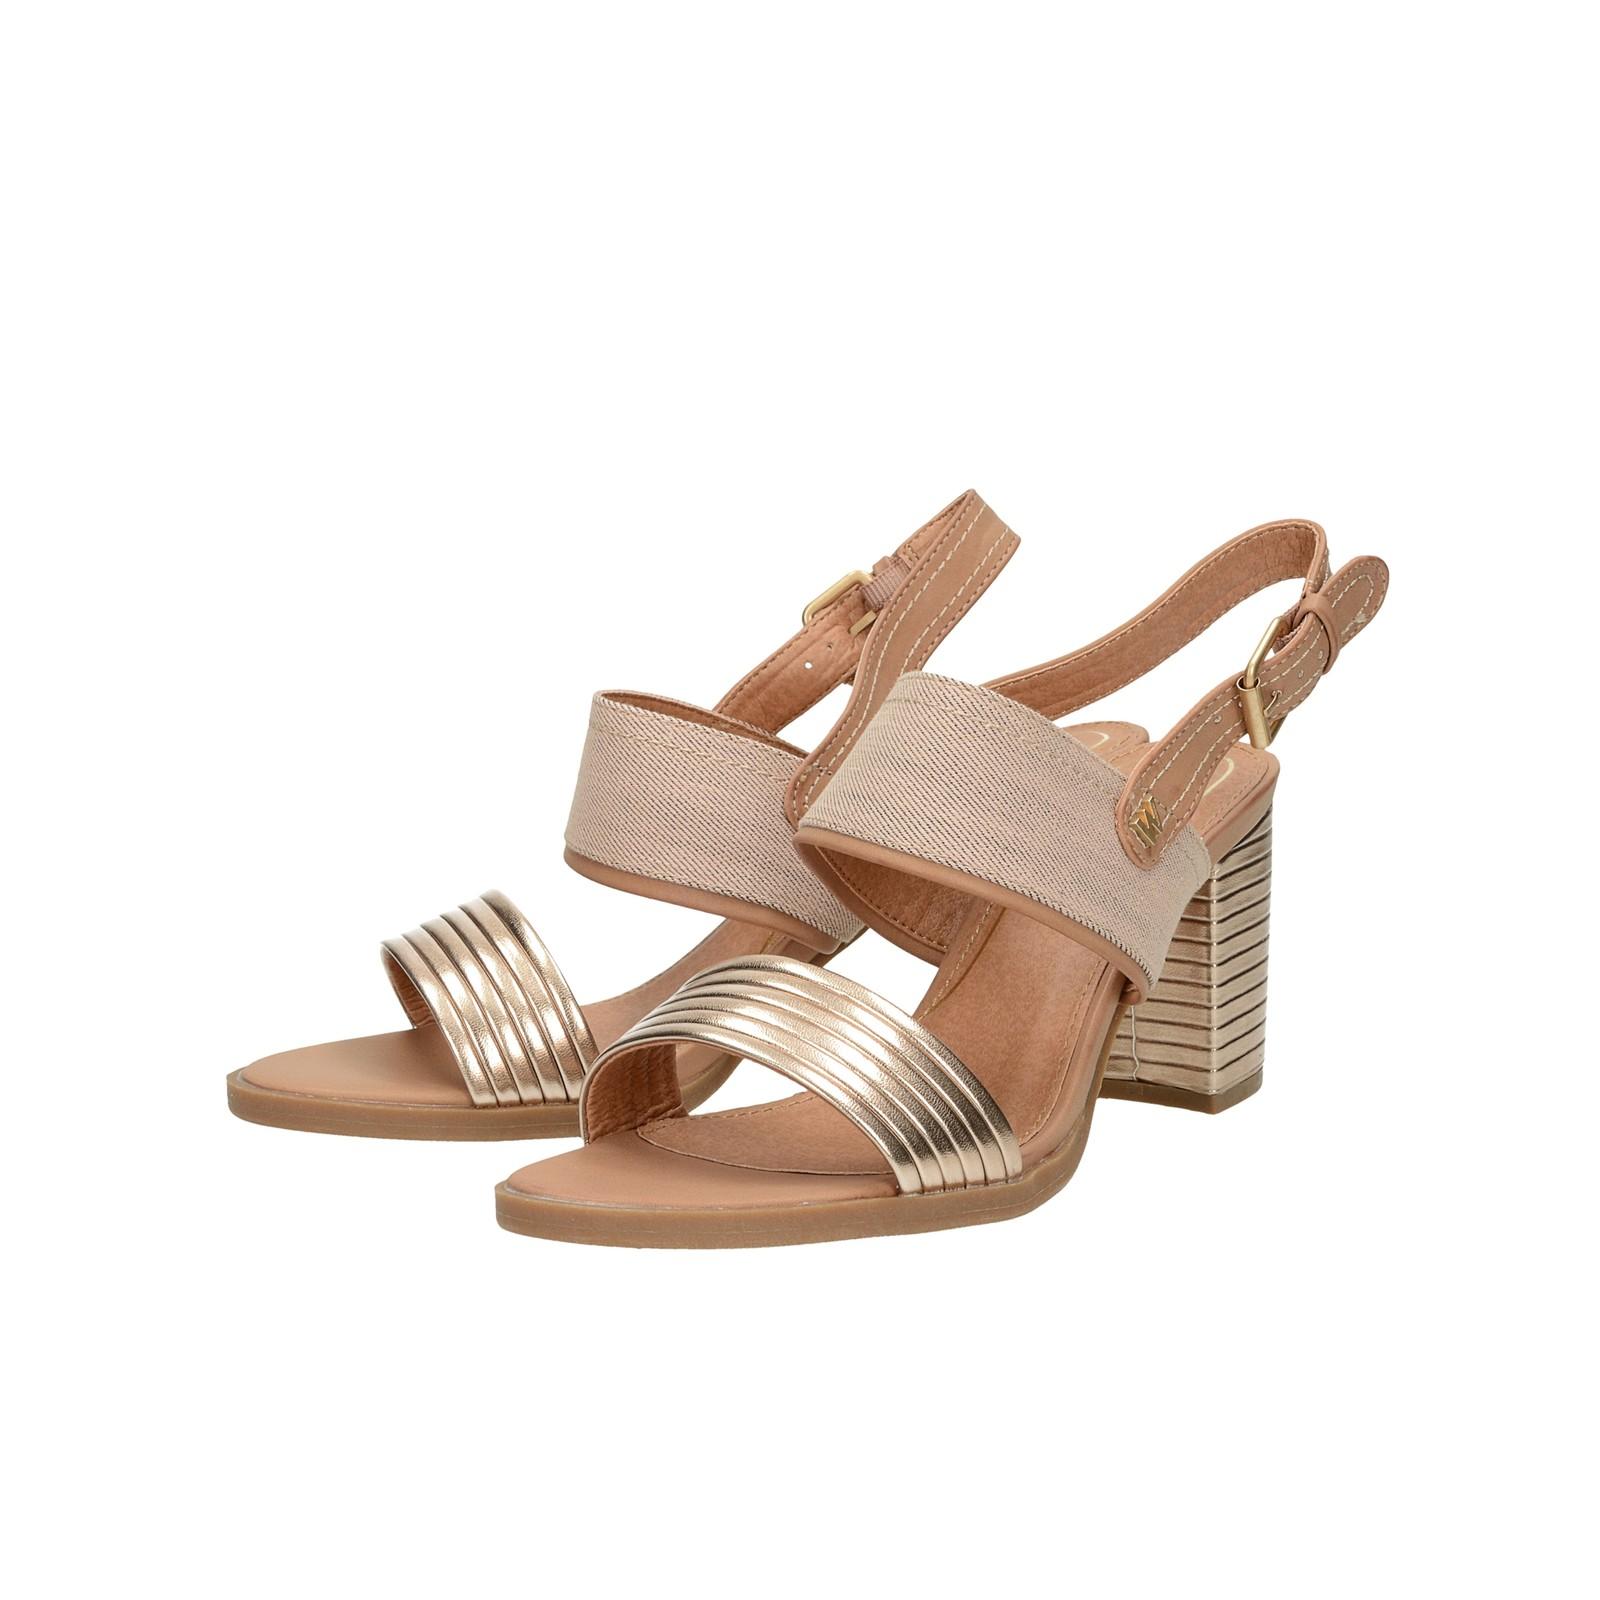 e10d7382f7c0 Wrangler dámske štýlové sandále - béžové ...